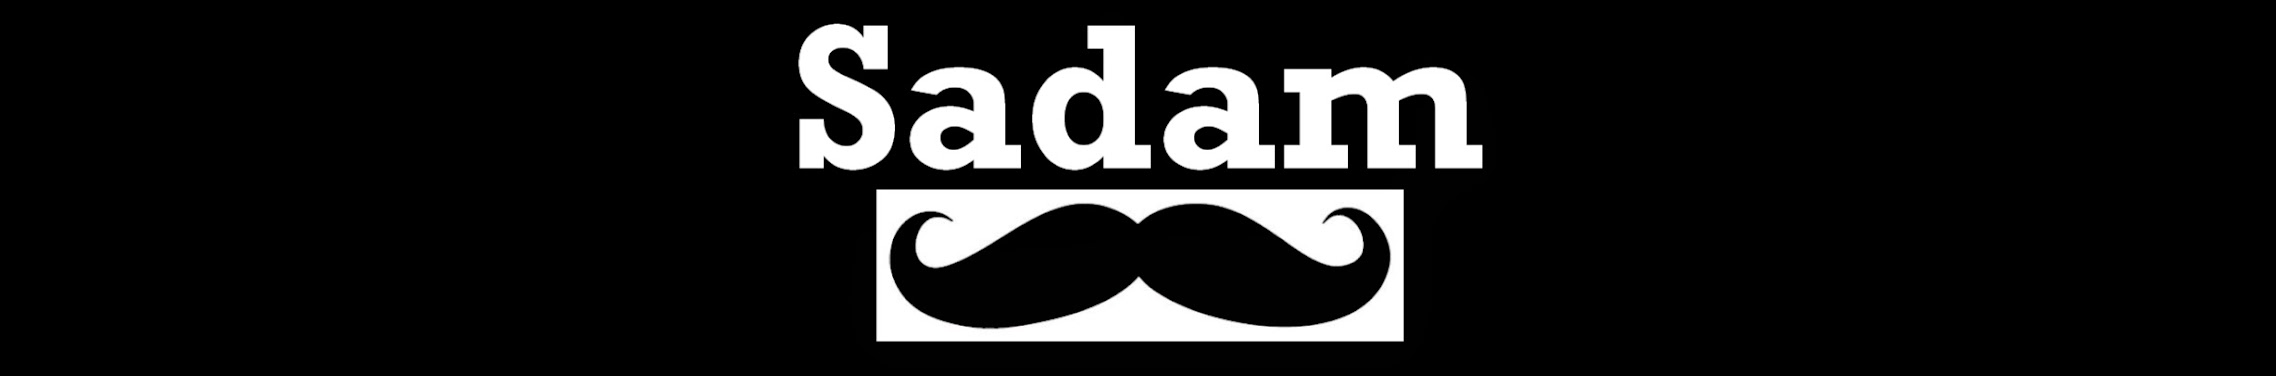 Sadam